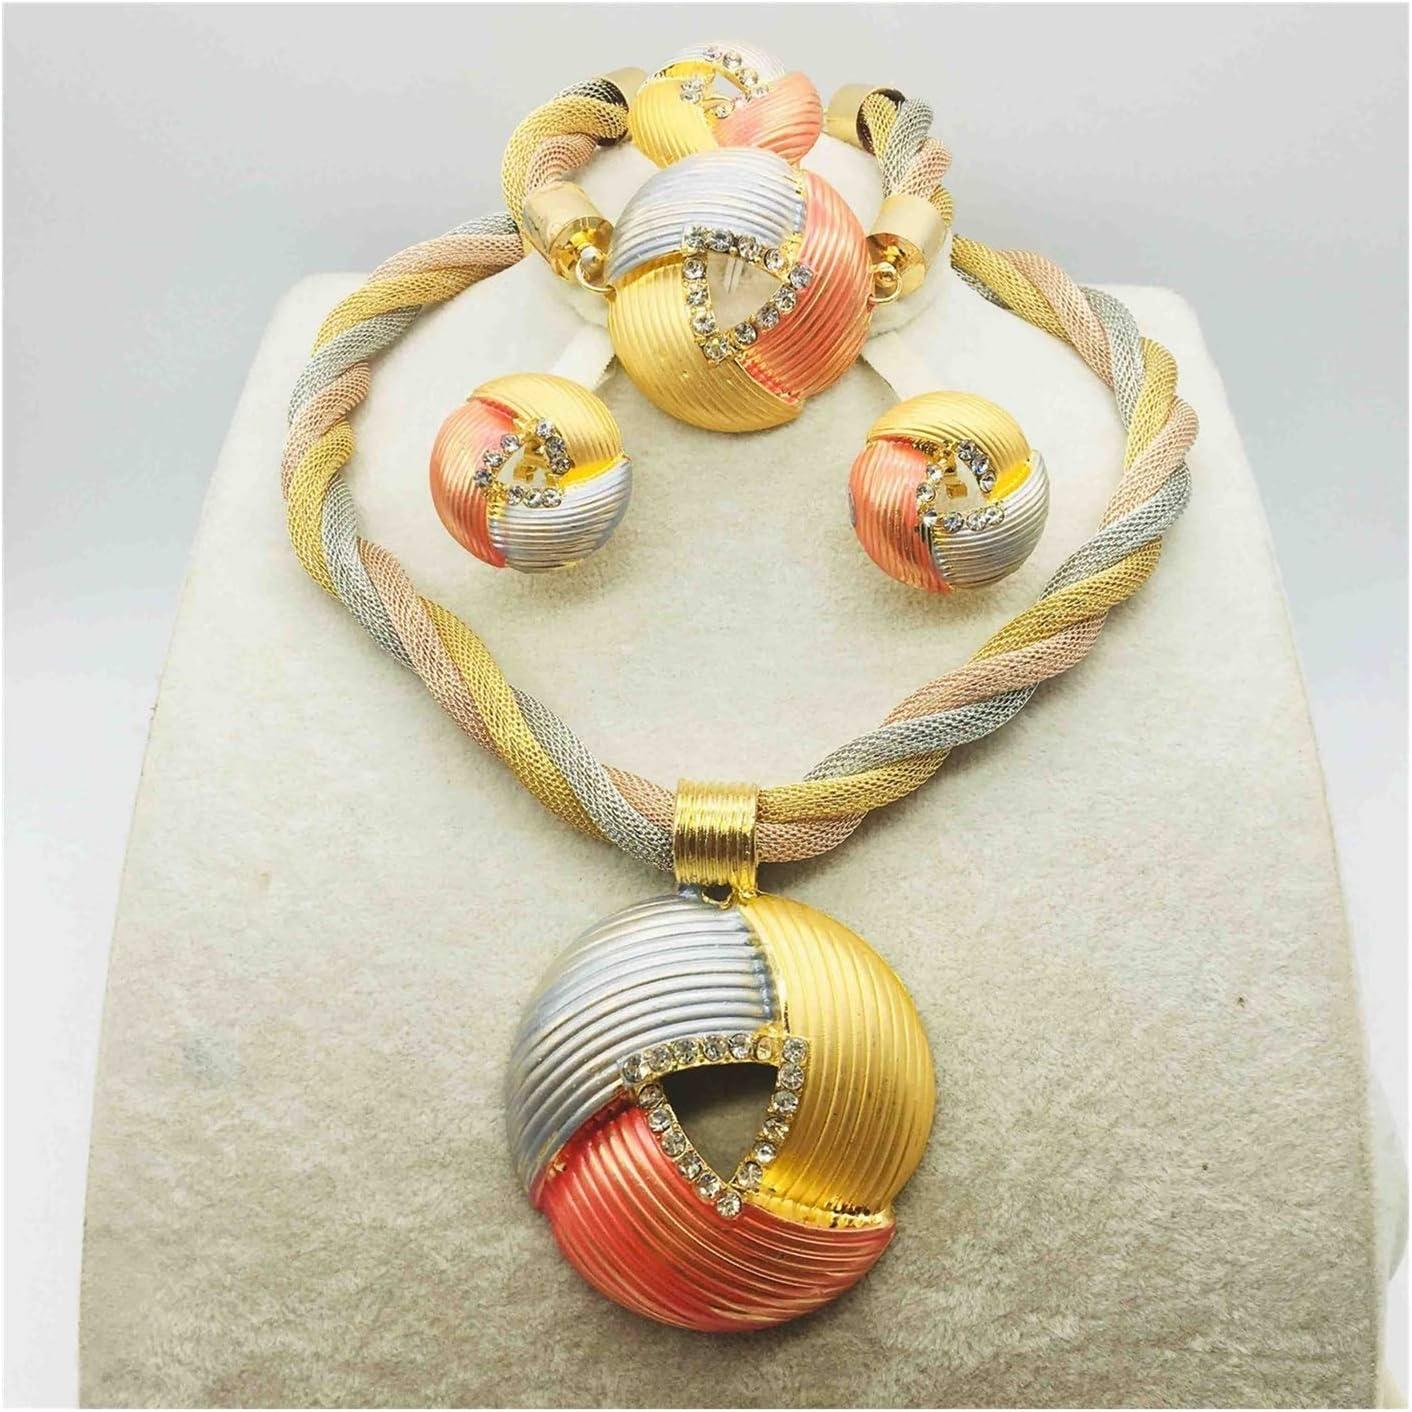 DSJTCH Bridal Gift Nigerian Wedding African Beads Jewelry Set Woman Fashion Dubai Gold Color Jewelry Set Design (Metal Color : Rose Gold Color)